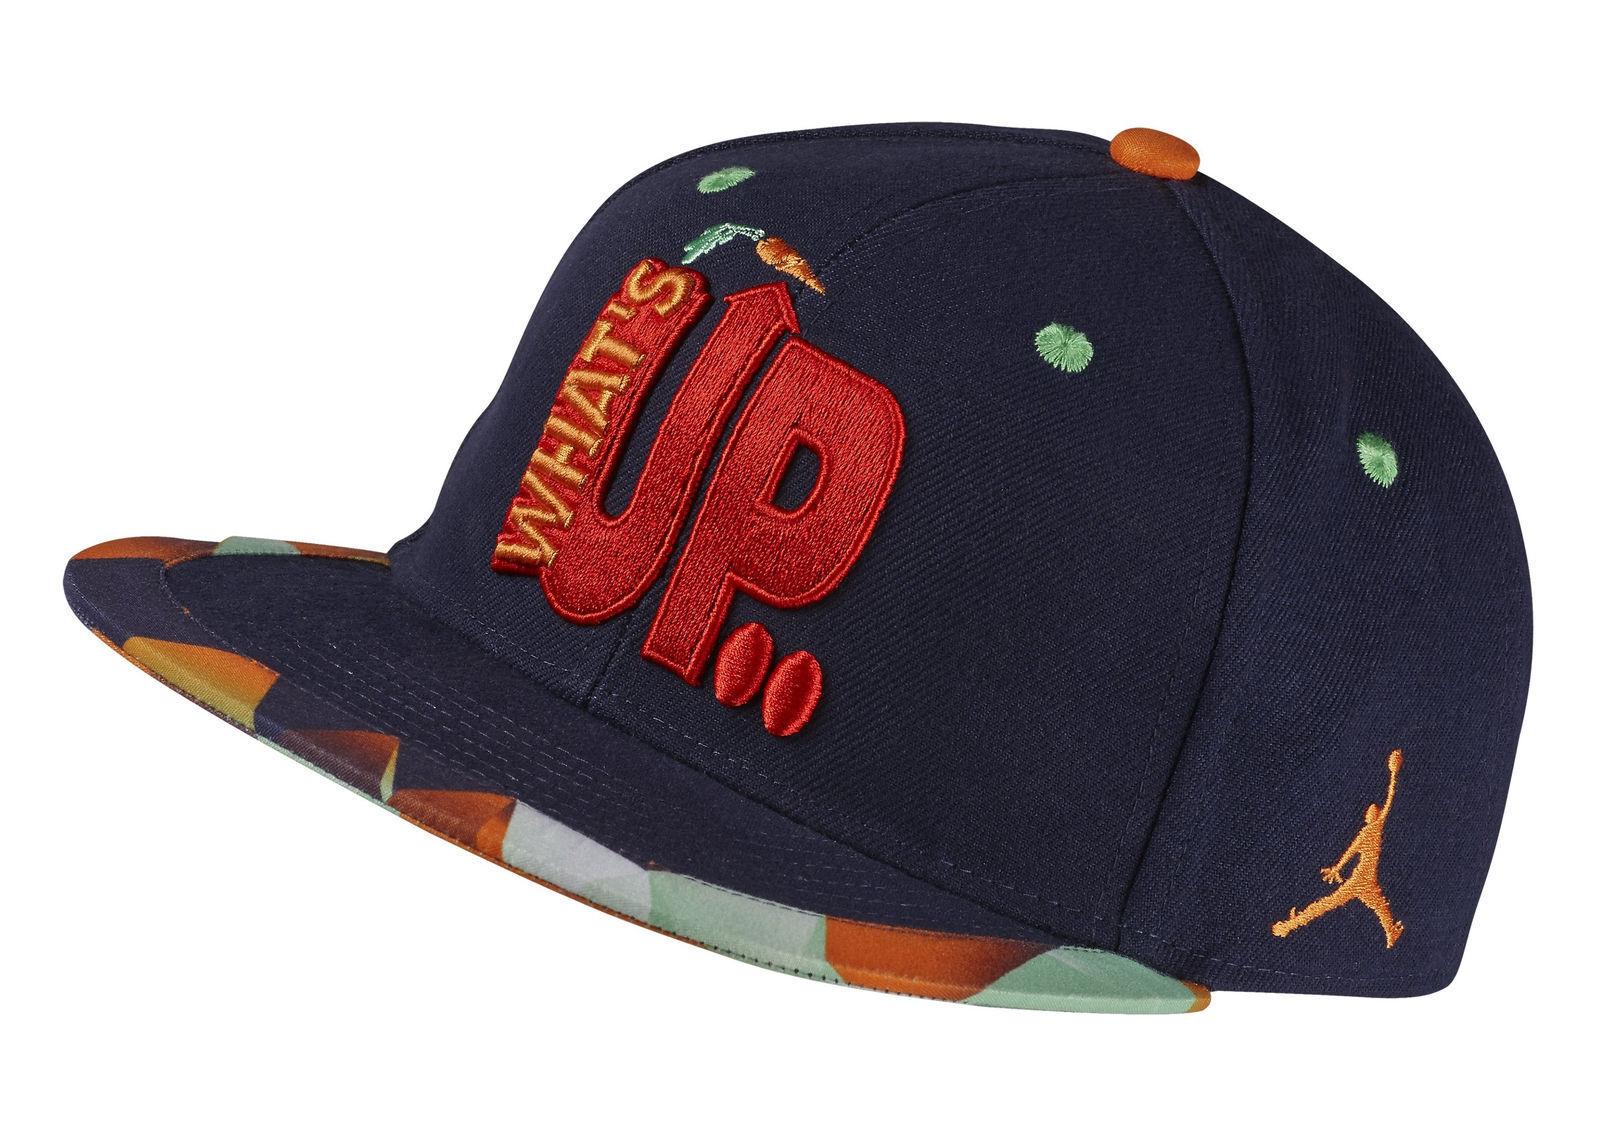 29e6deee3c564 Nike Jordan Space Jam Snapback Cap